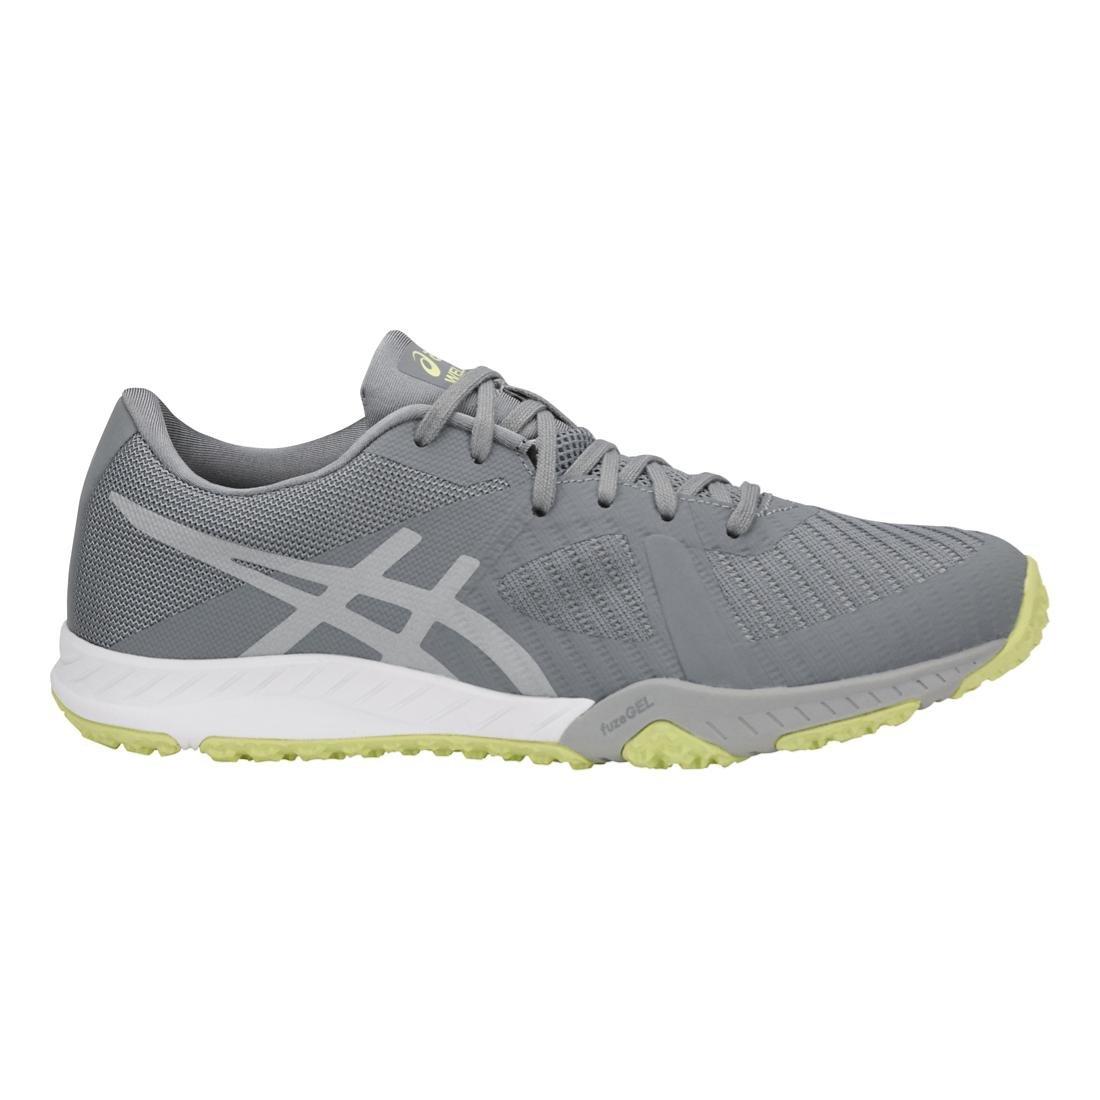 ASICS Womens Weldon x Fabric Low Top Lace up Running Sneaker B0719HJ7F6 9 B(M) US|Stone Grey/Mid Grey/Limelight